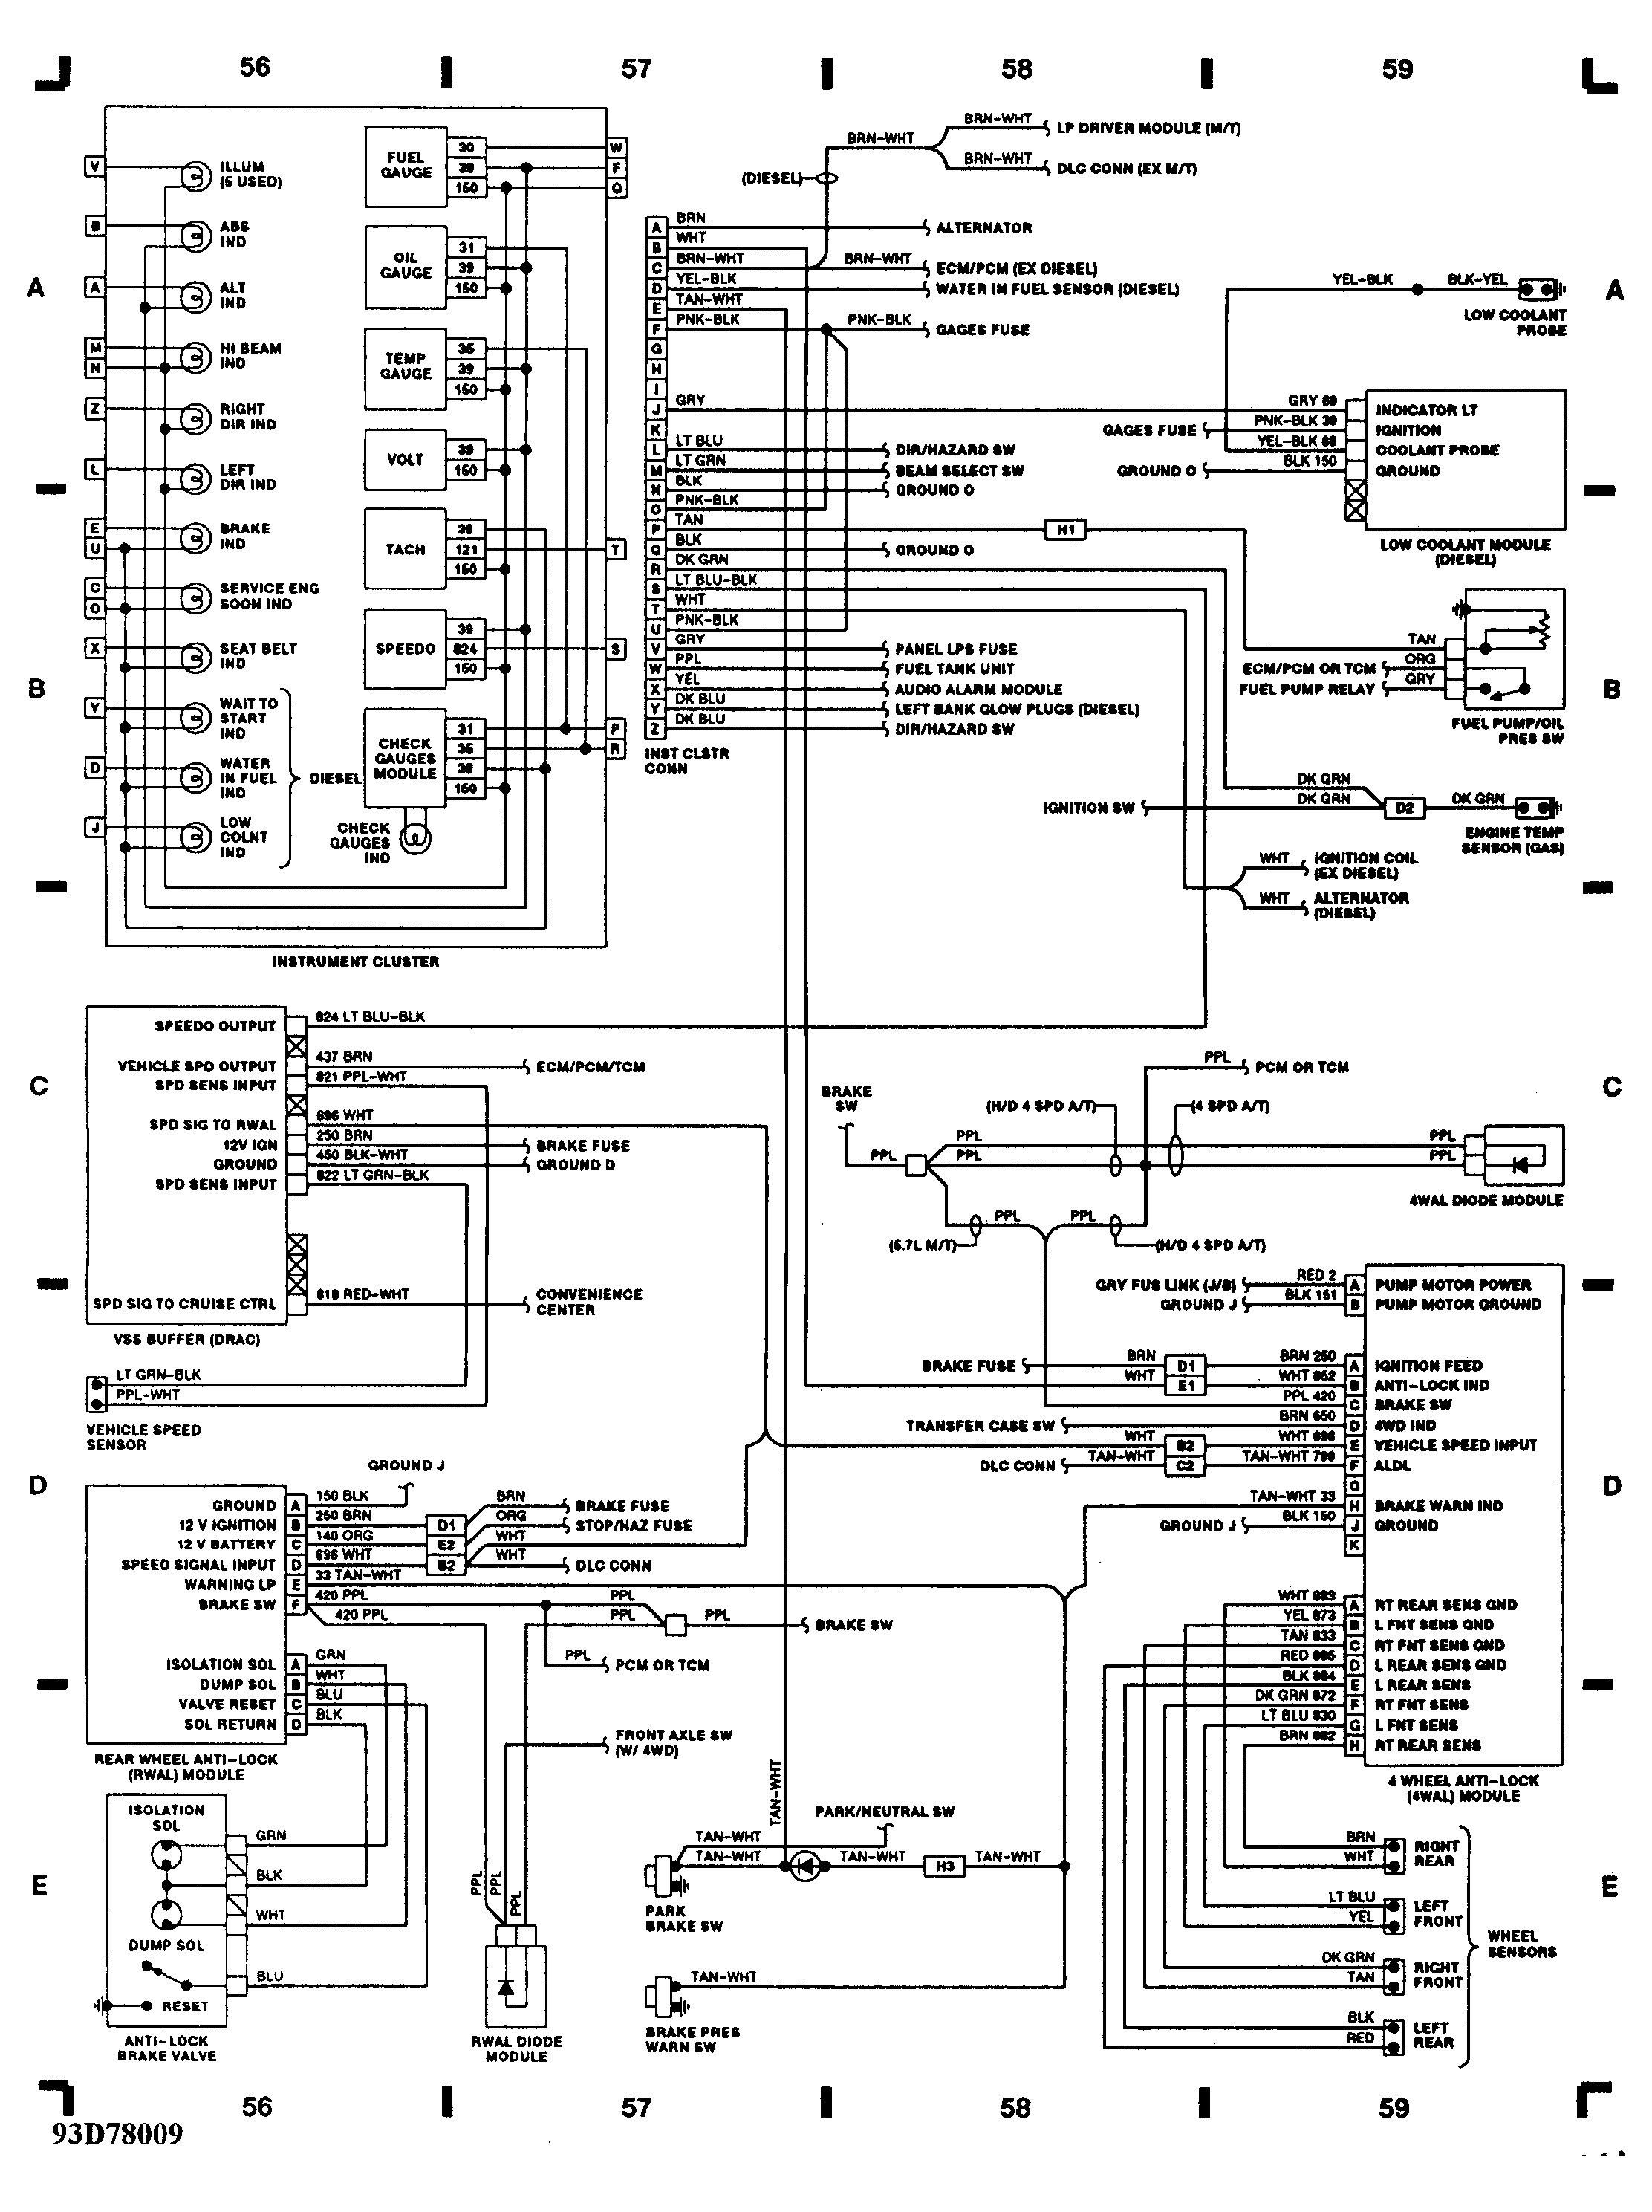 1996 Chevy Truck Wiring Diagram